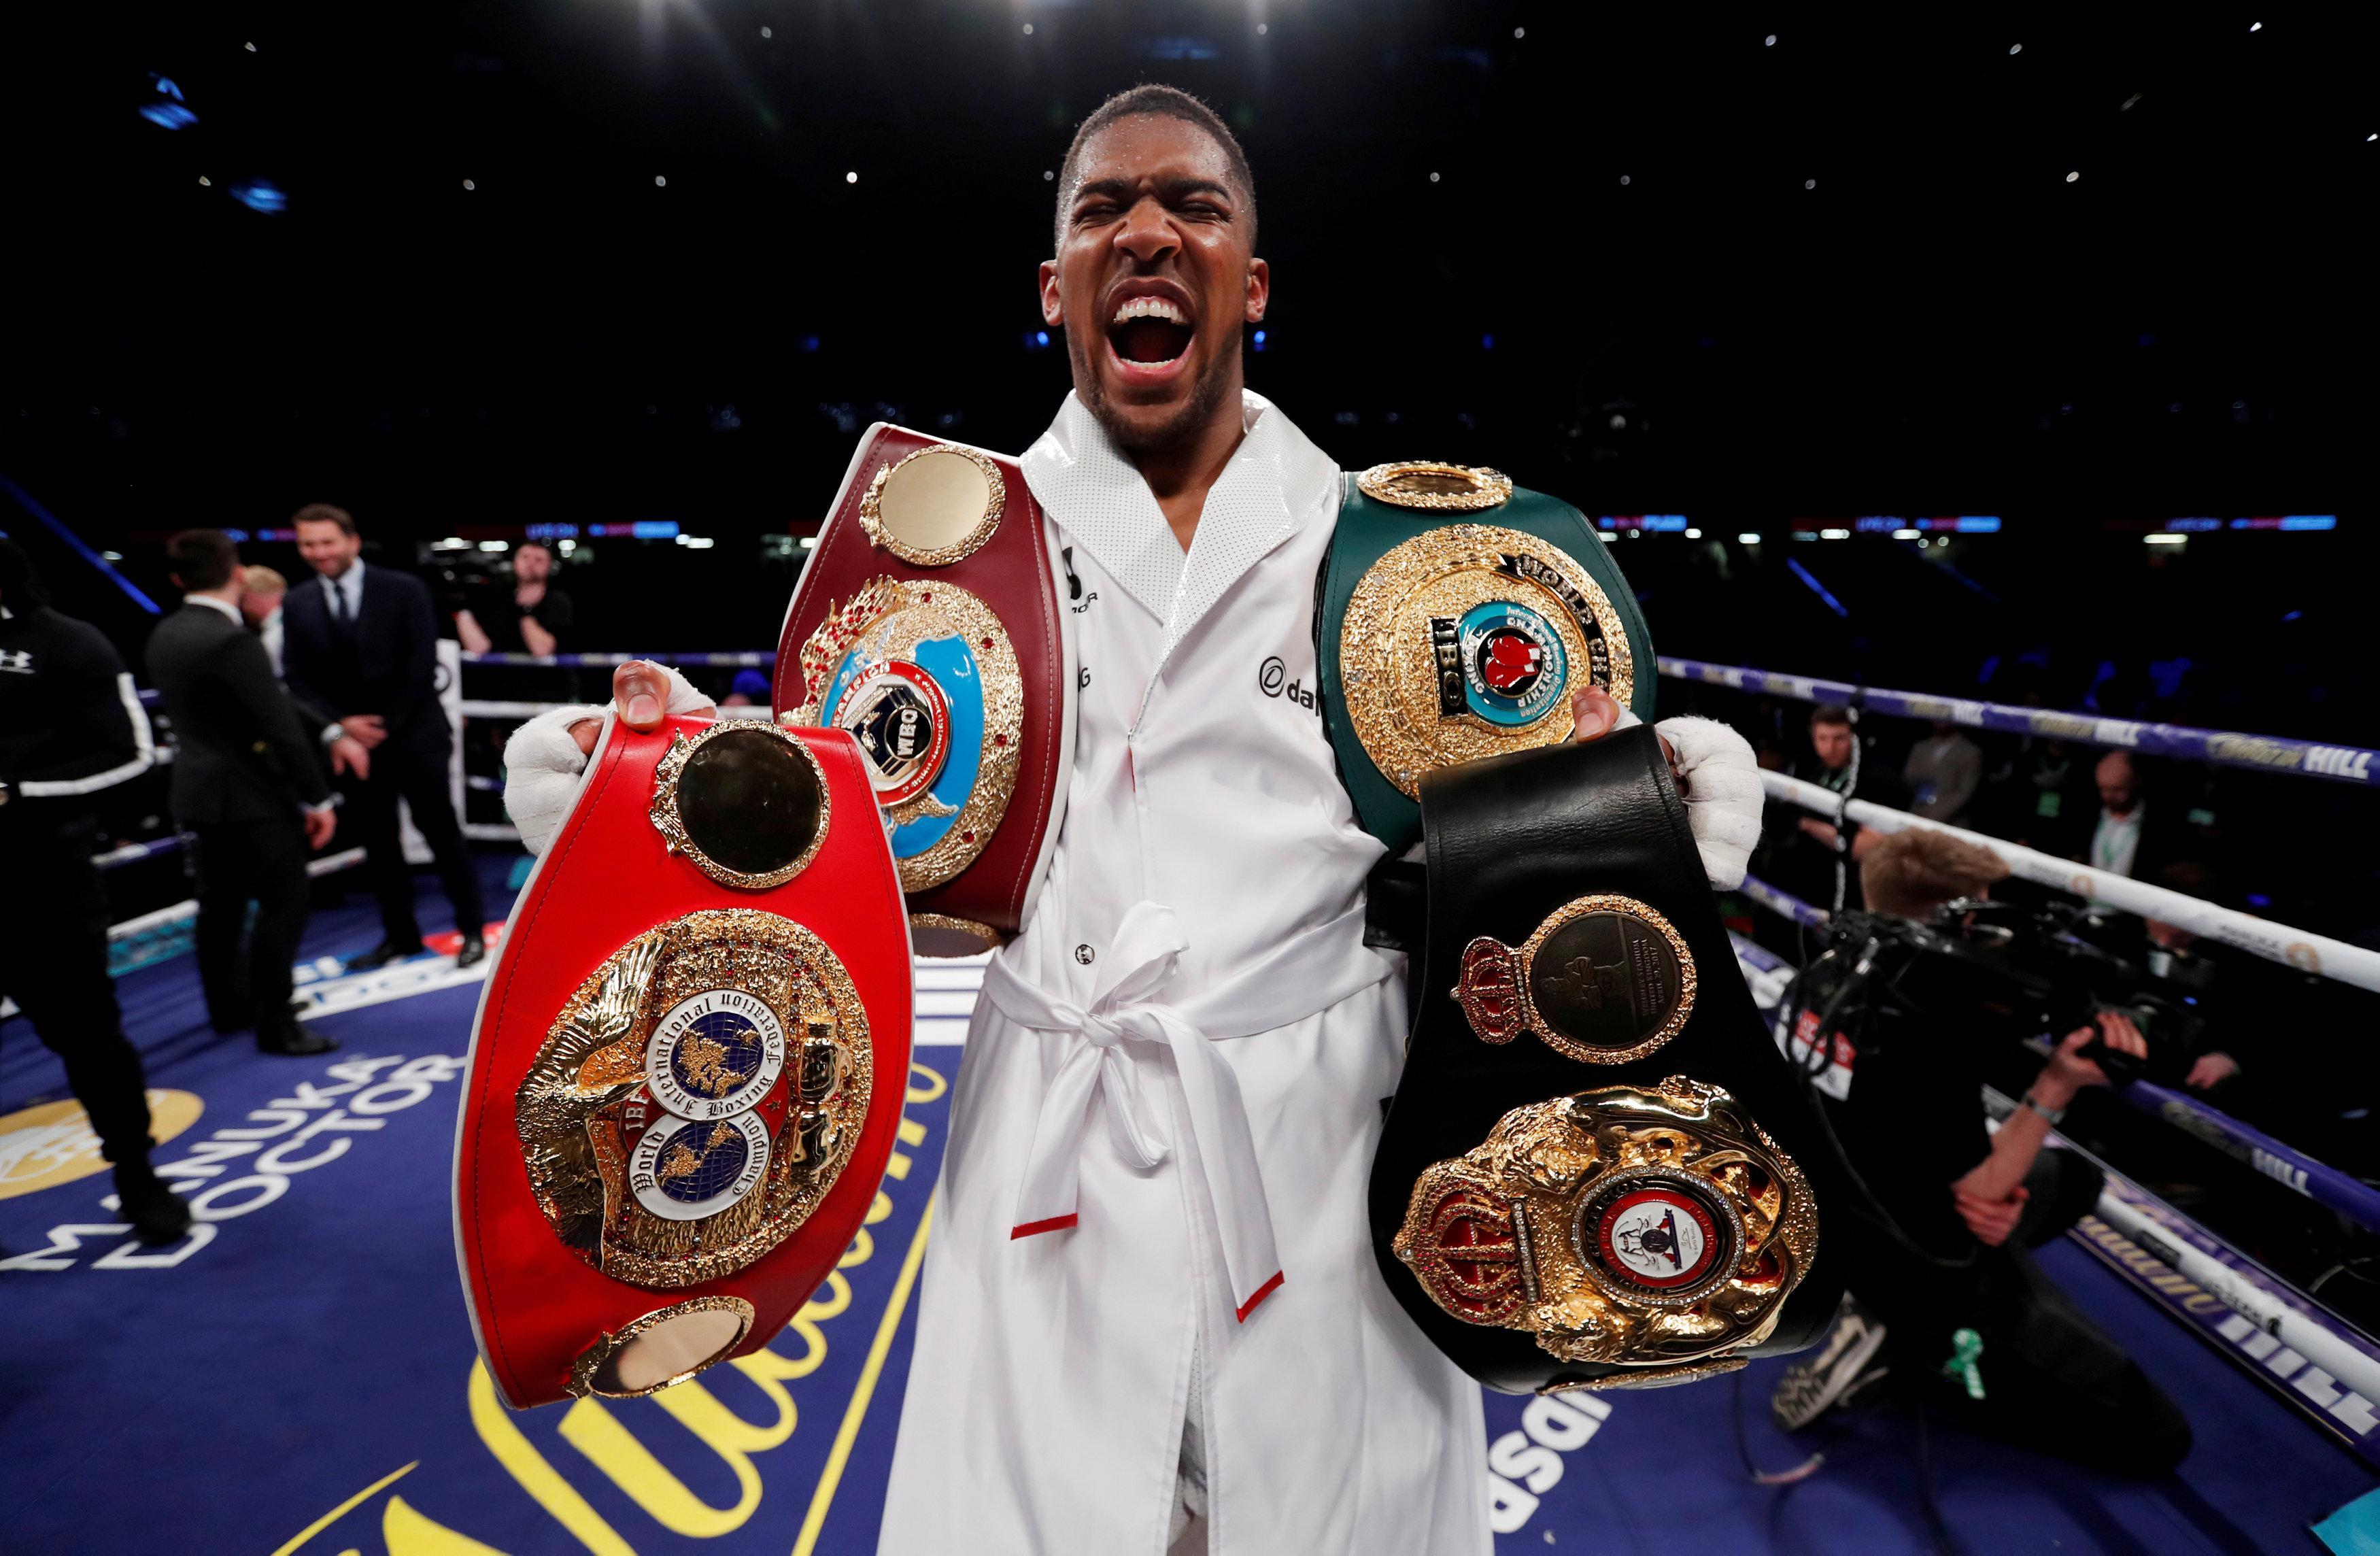 Anthony Joshua is the current WBA, WBO, IBF and IBO heavyweight champion